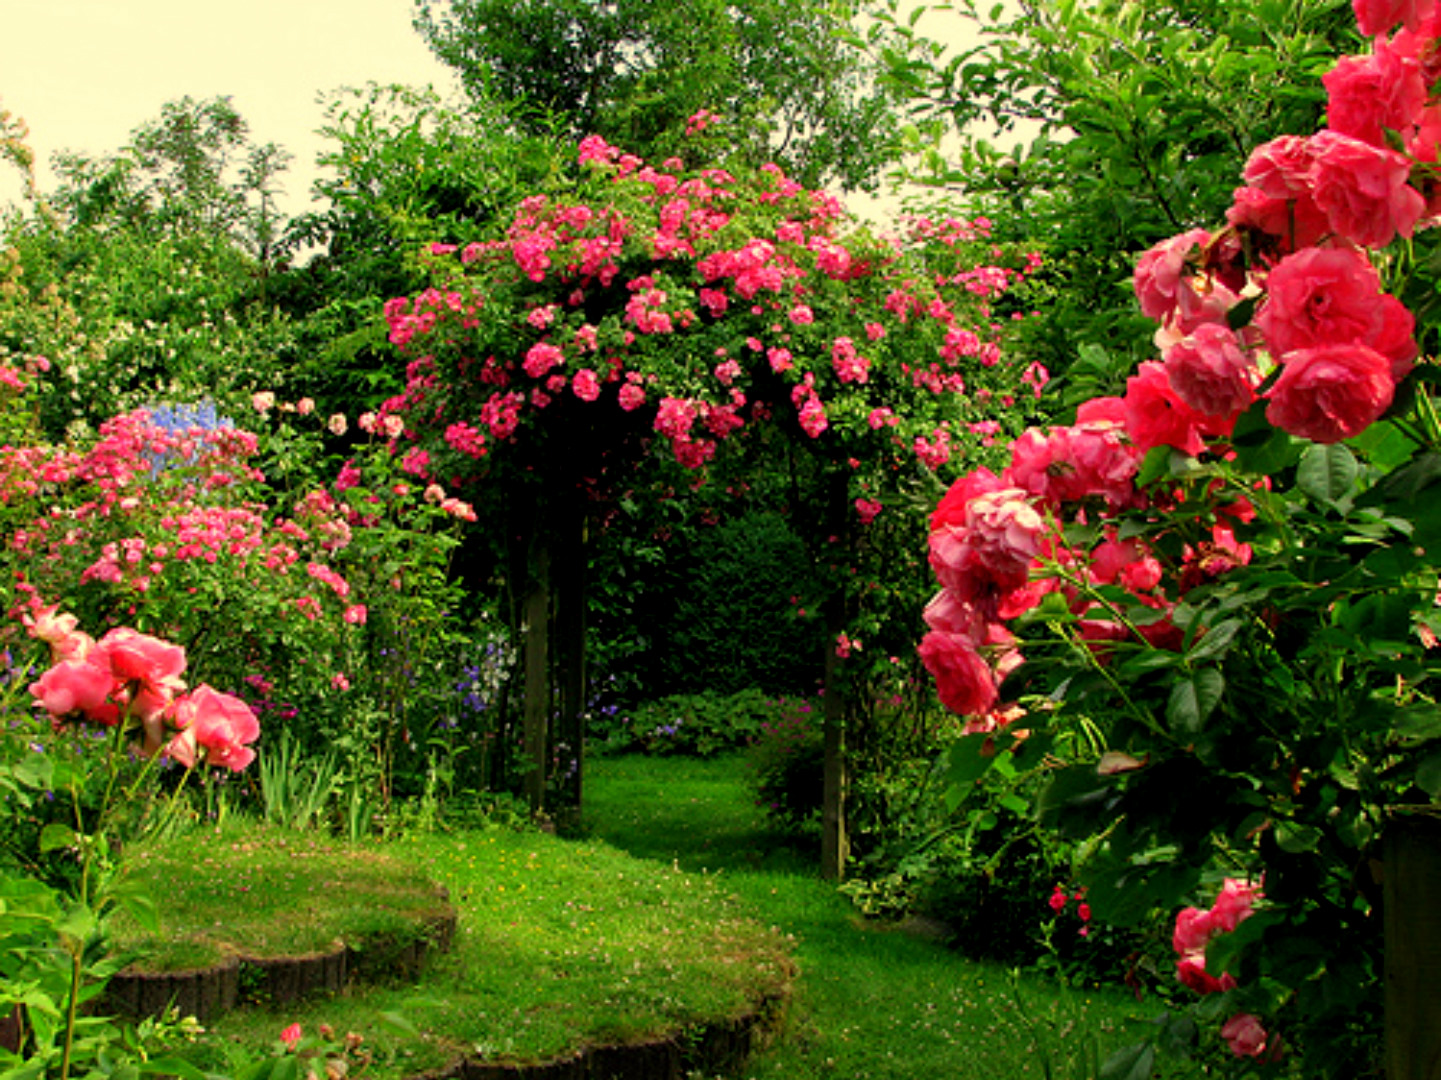 Garden Flowers Wallpaper rose flower background - wallpapersafari